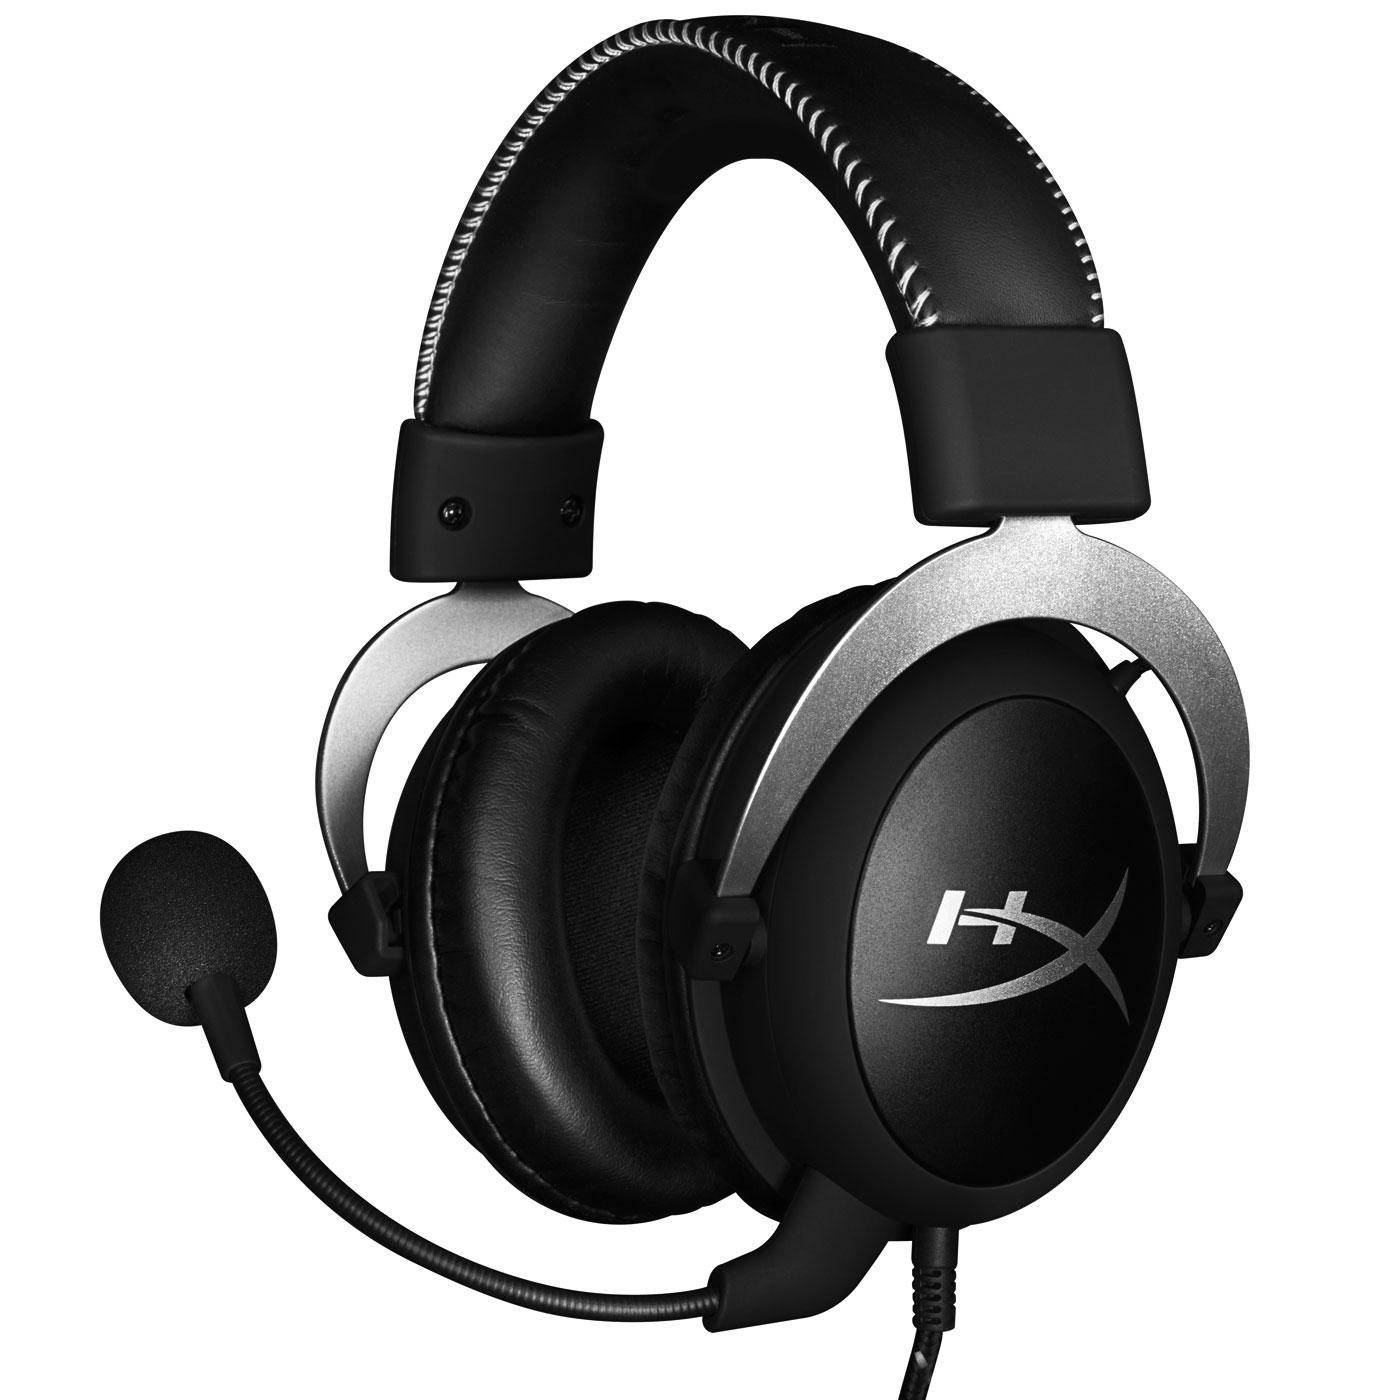 HyperX CloudX Gaming Headset (Silver) (HX-HSCX-SR/EM) - Achat / Vente Micro-casque sur Cybertek.fr - 0